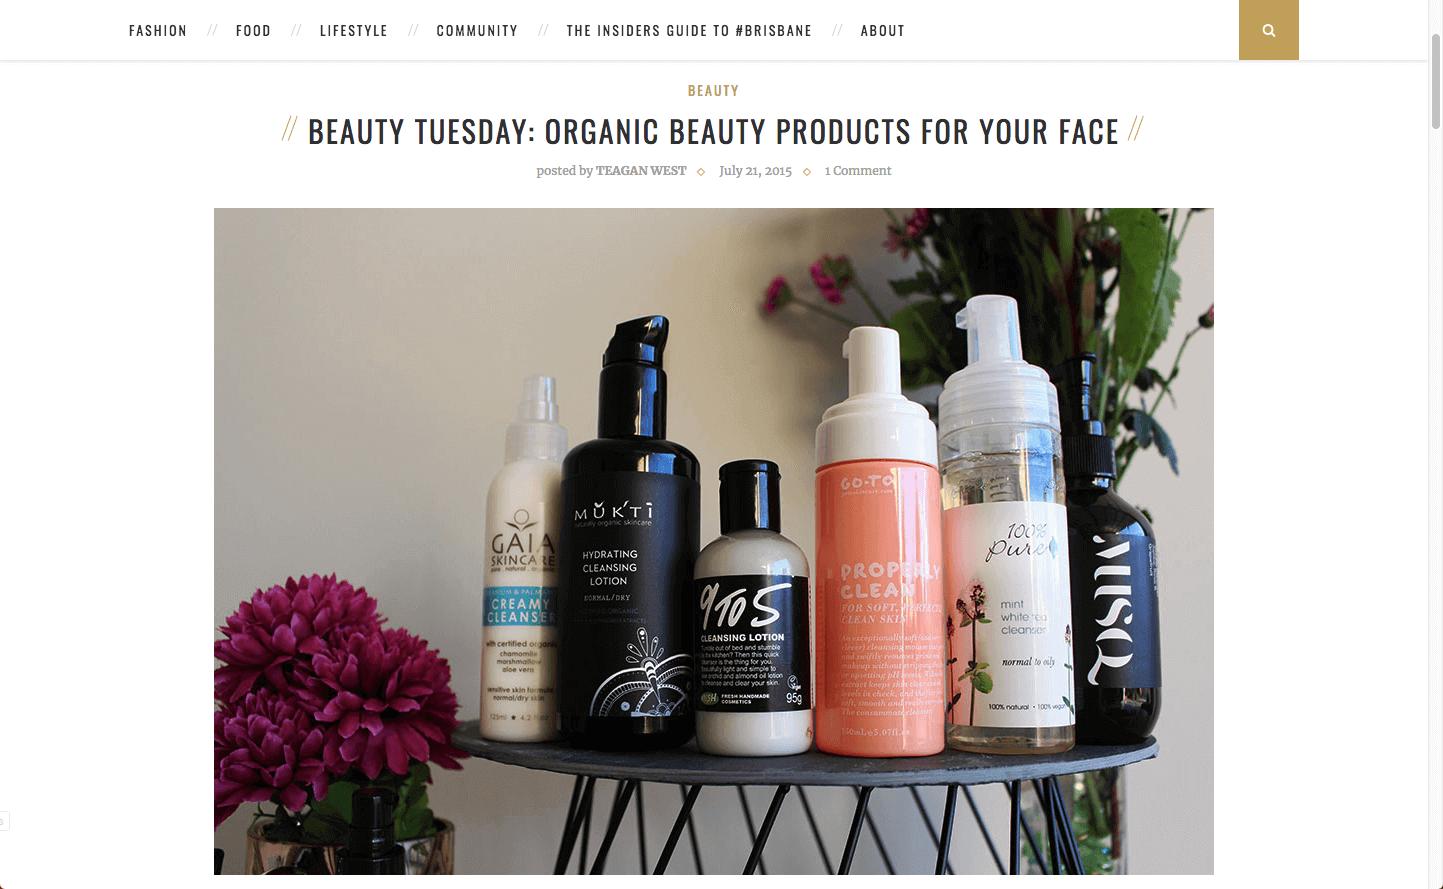 Brisbane Threads Musq Cosmetics